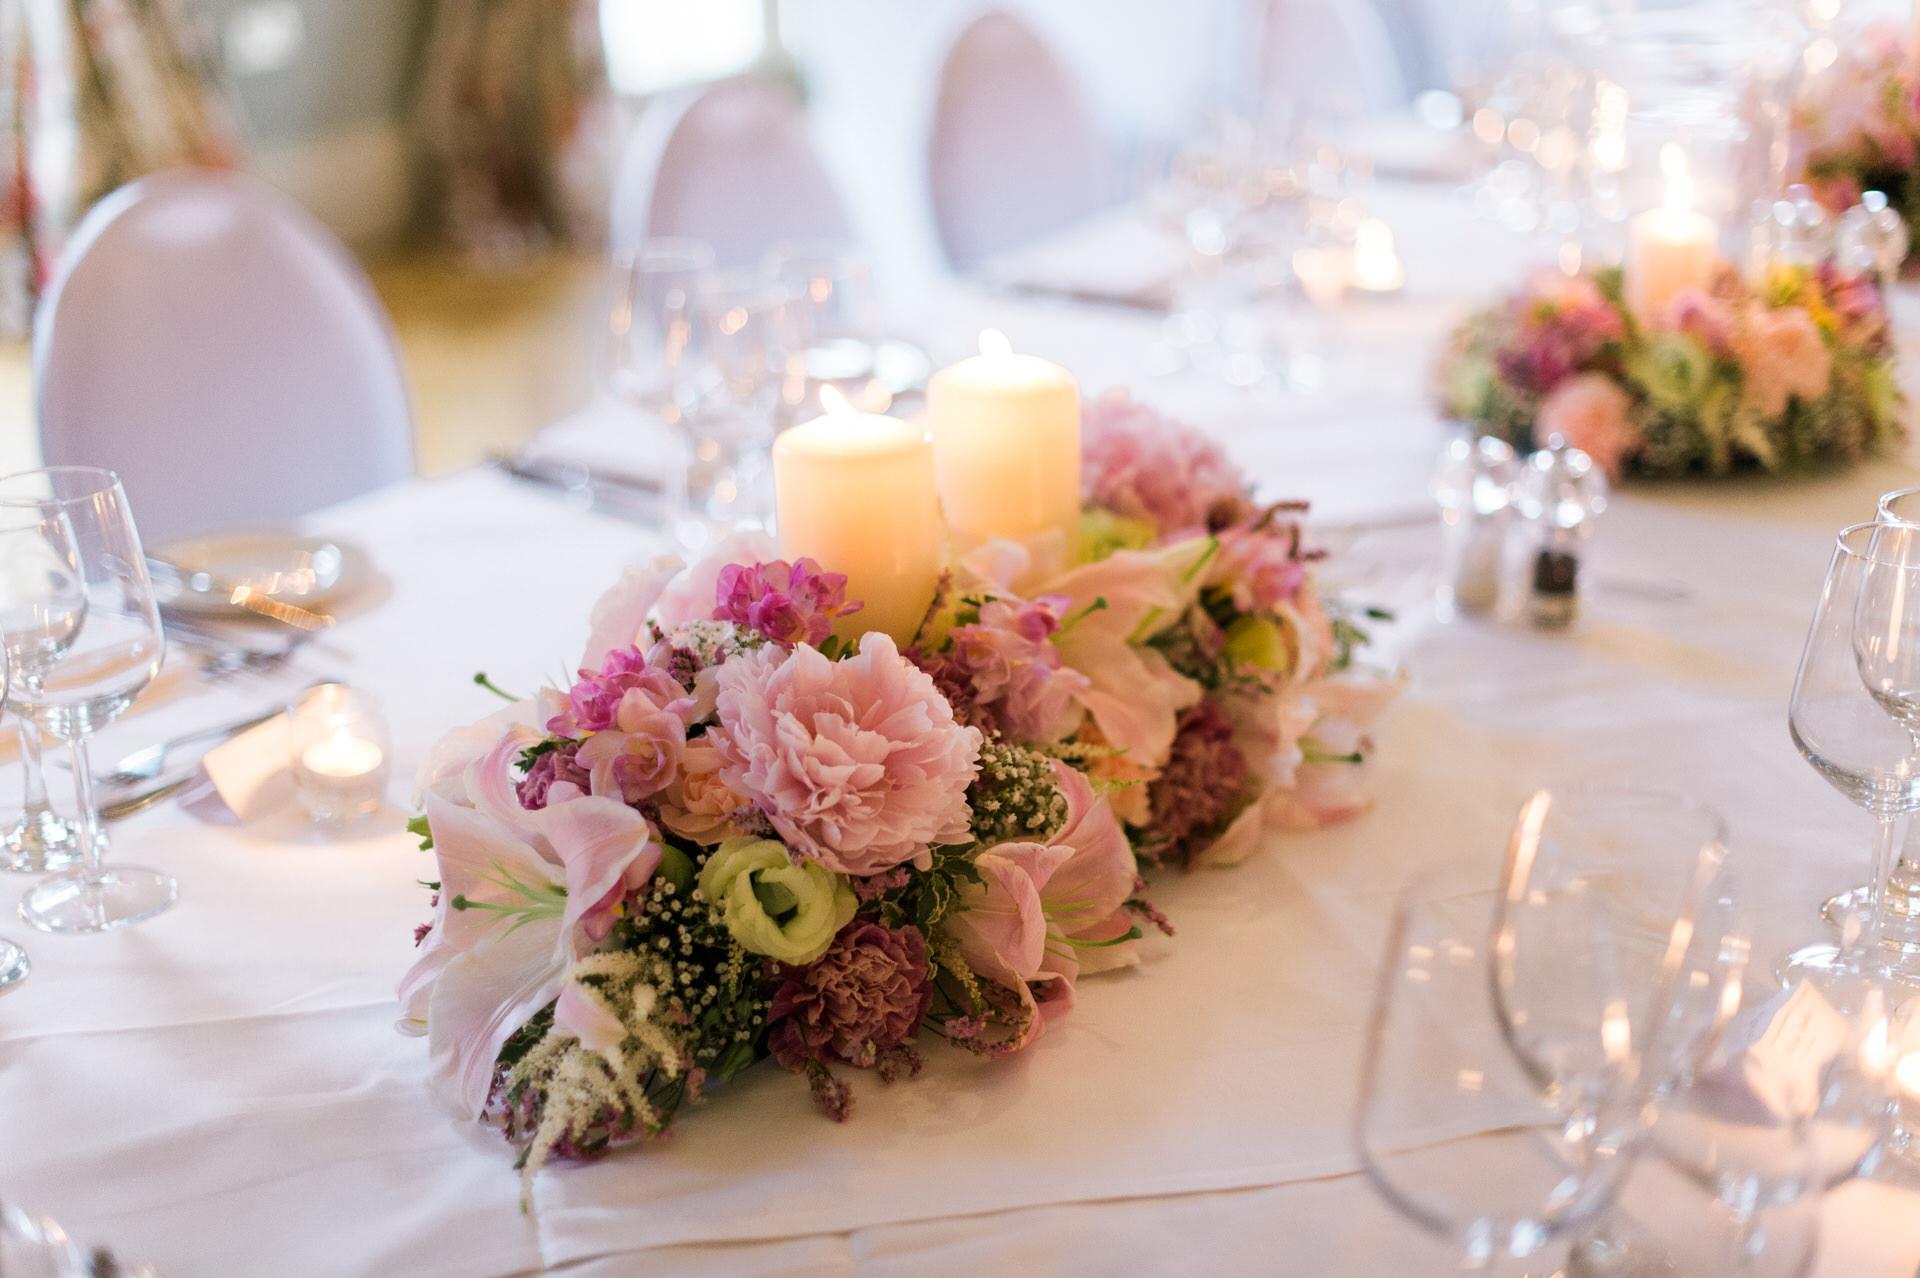 Charlton House wedding details